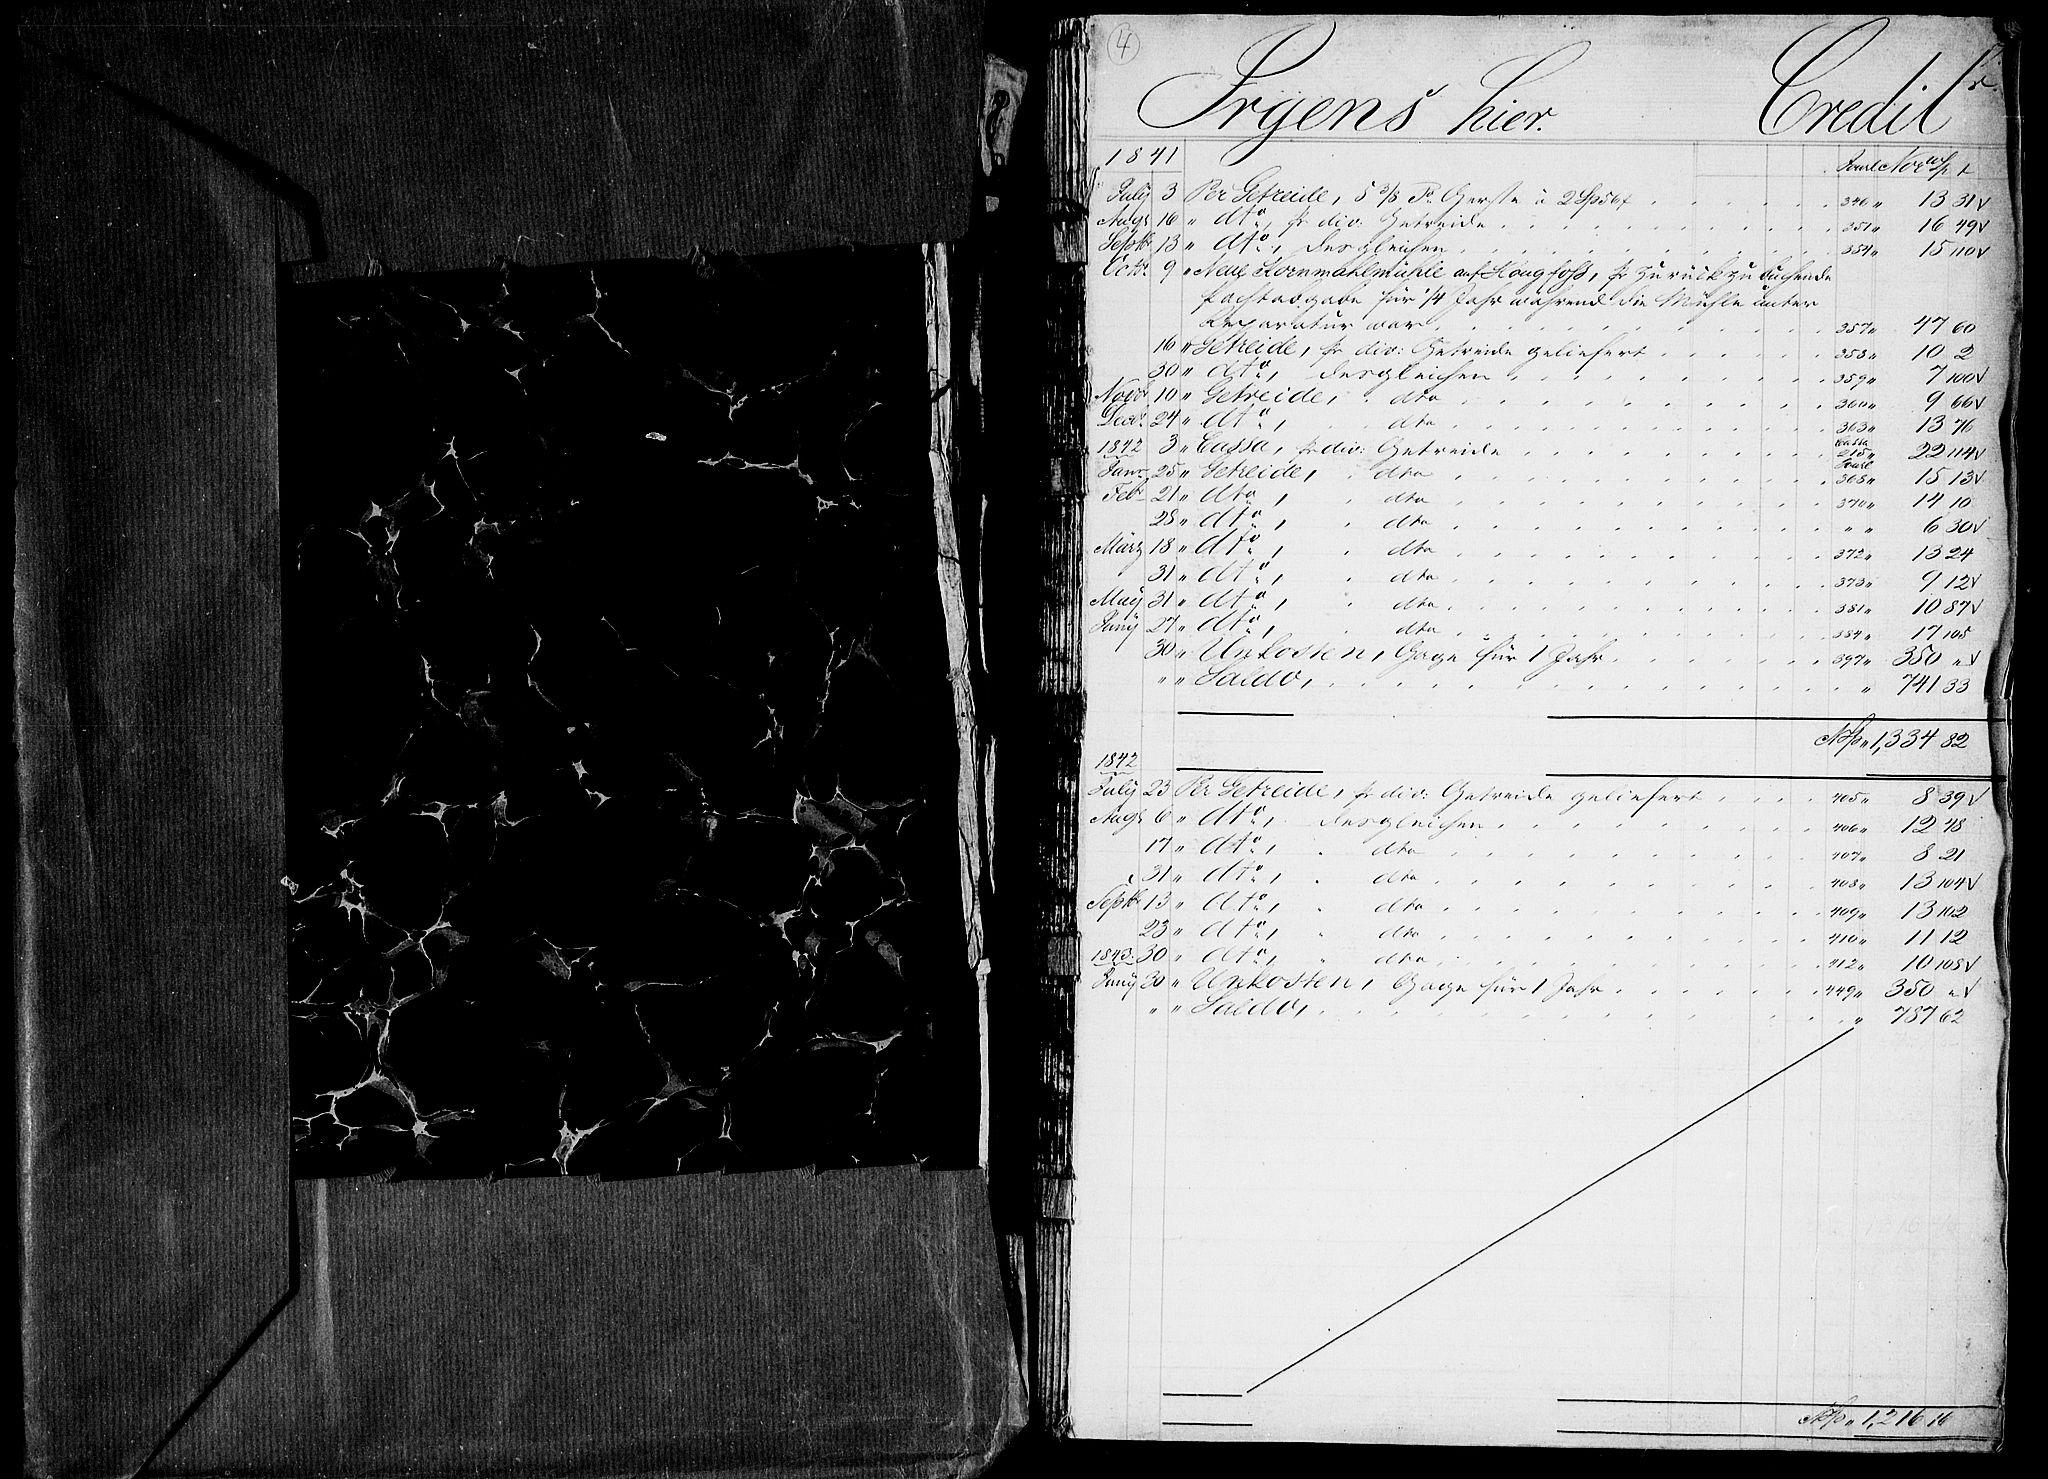 RA, Modums Blaafarveværk, G/Gd/Gda/L0166, 1839-1844, s. 2